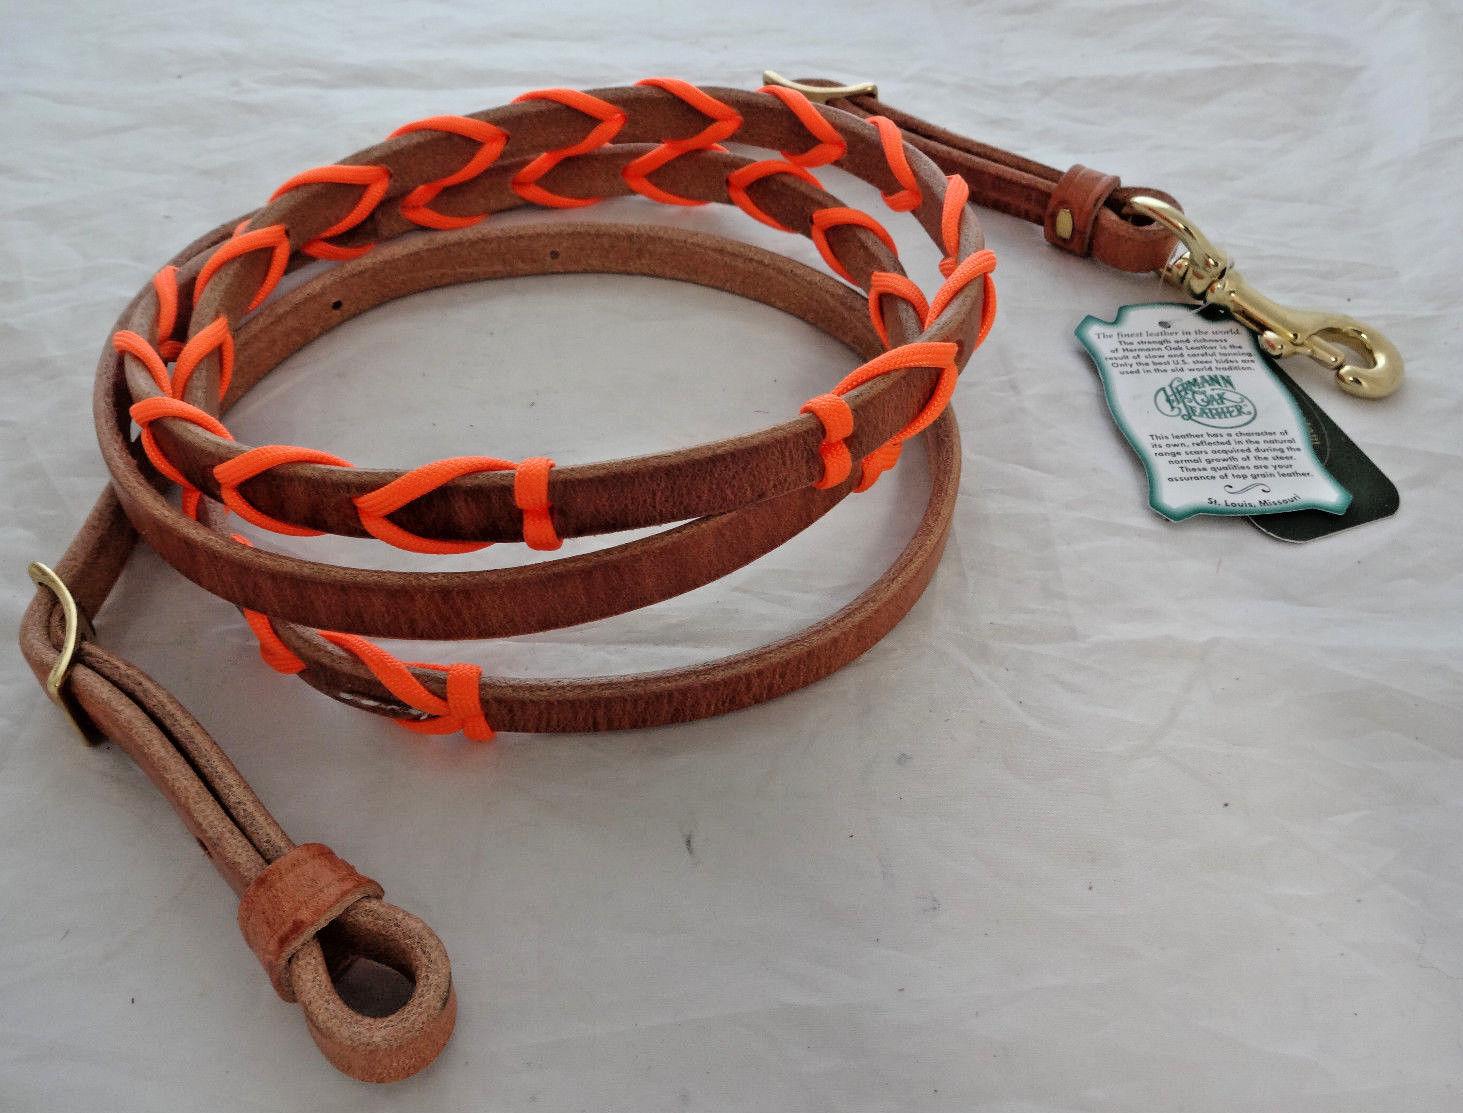 CANNA Roping Rein Heruomon Heruomon Heruomon Oak Imbracatura in pelle Paracord Laced Arancione Horse Tack 270